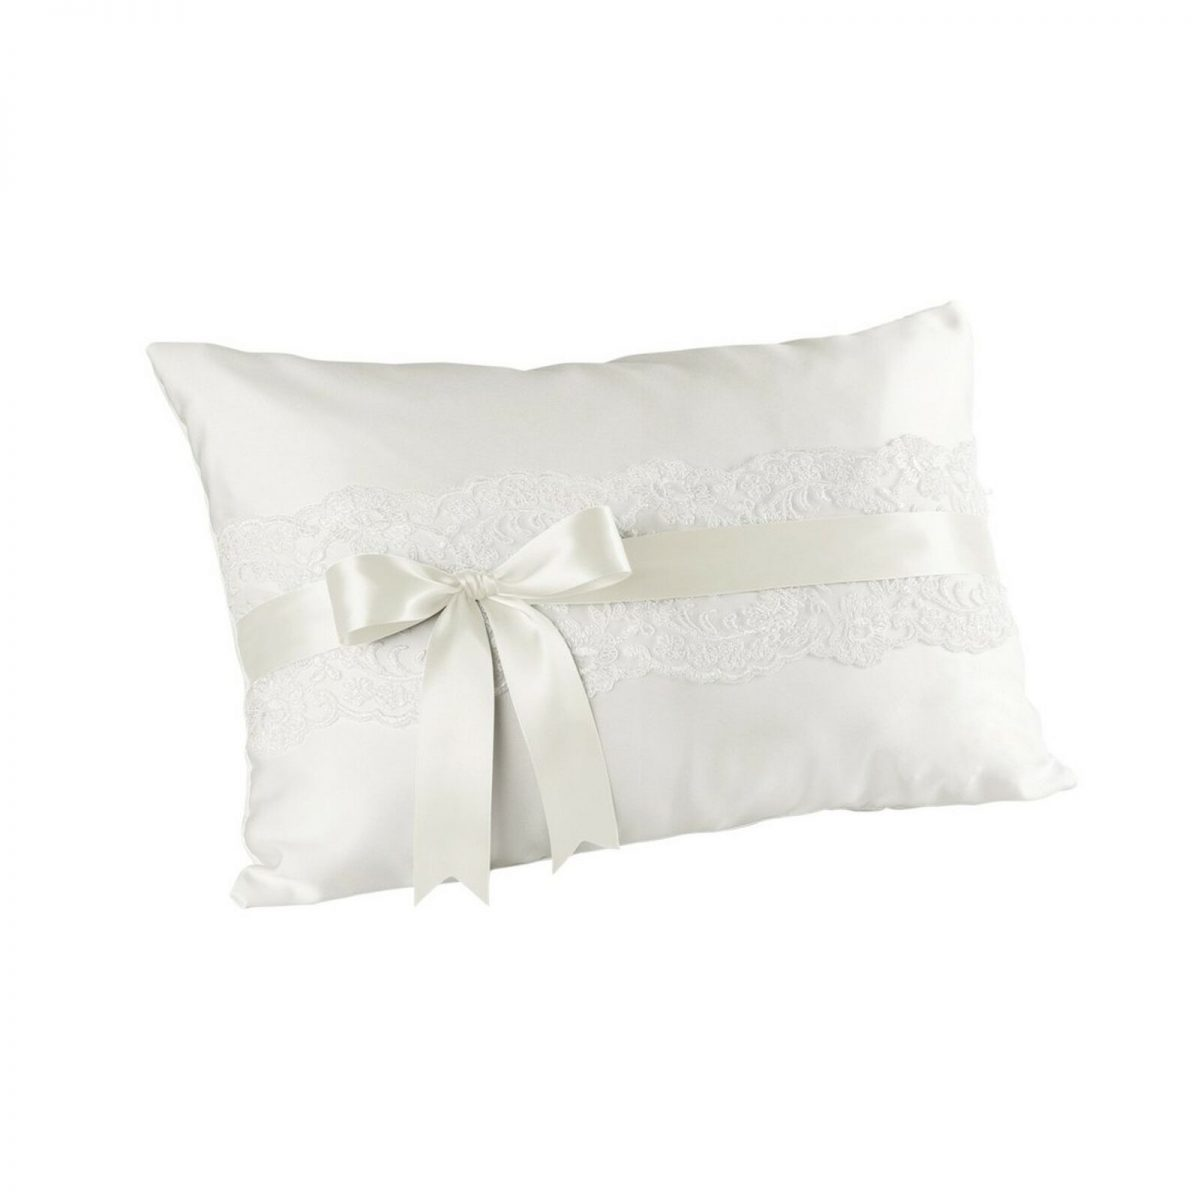 Beverly Clark's Audrey Ring Pillow